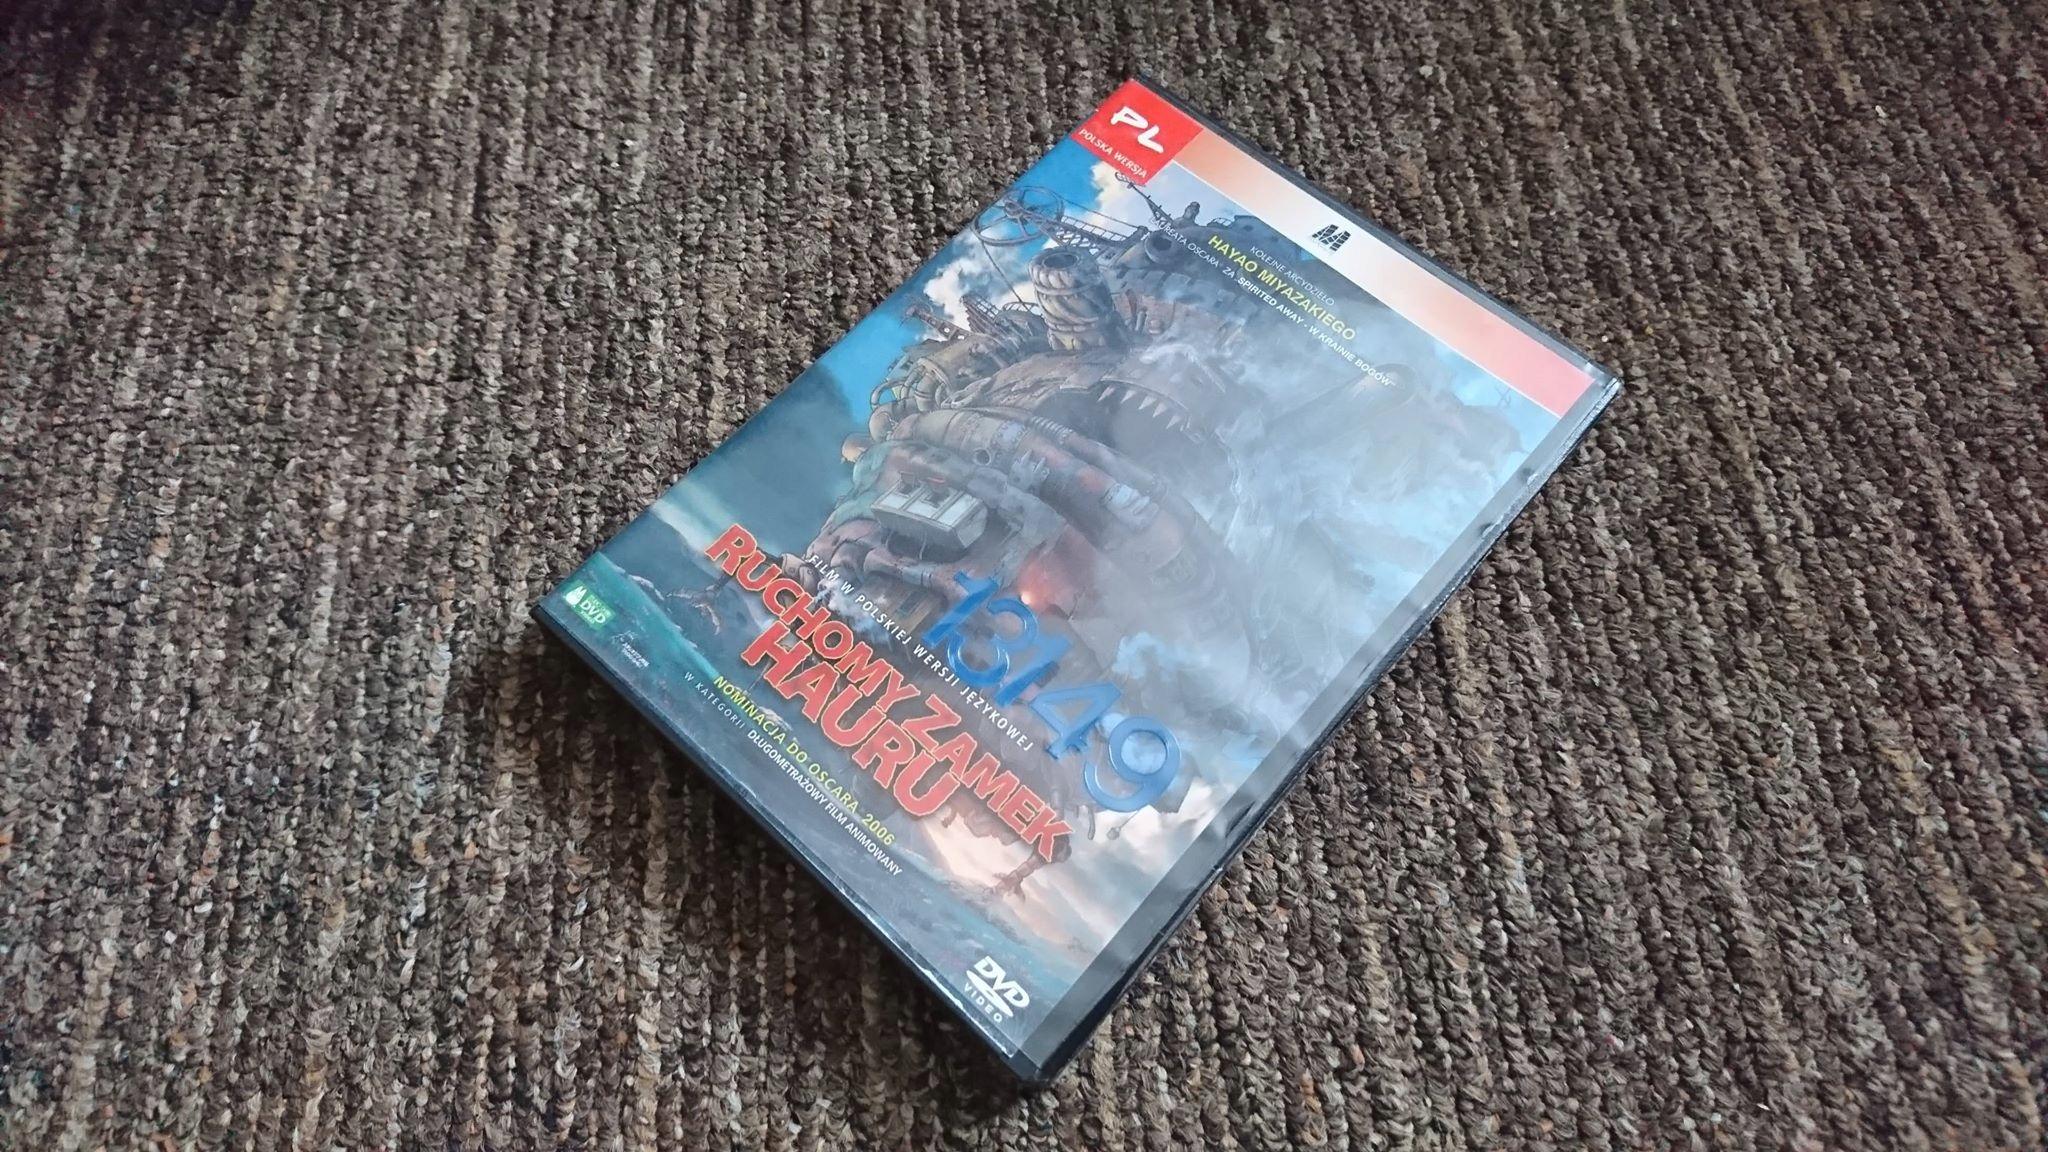 Ruchomy zamek Hauru DVD